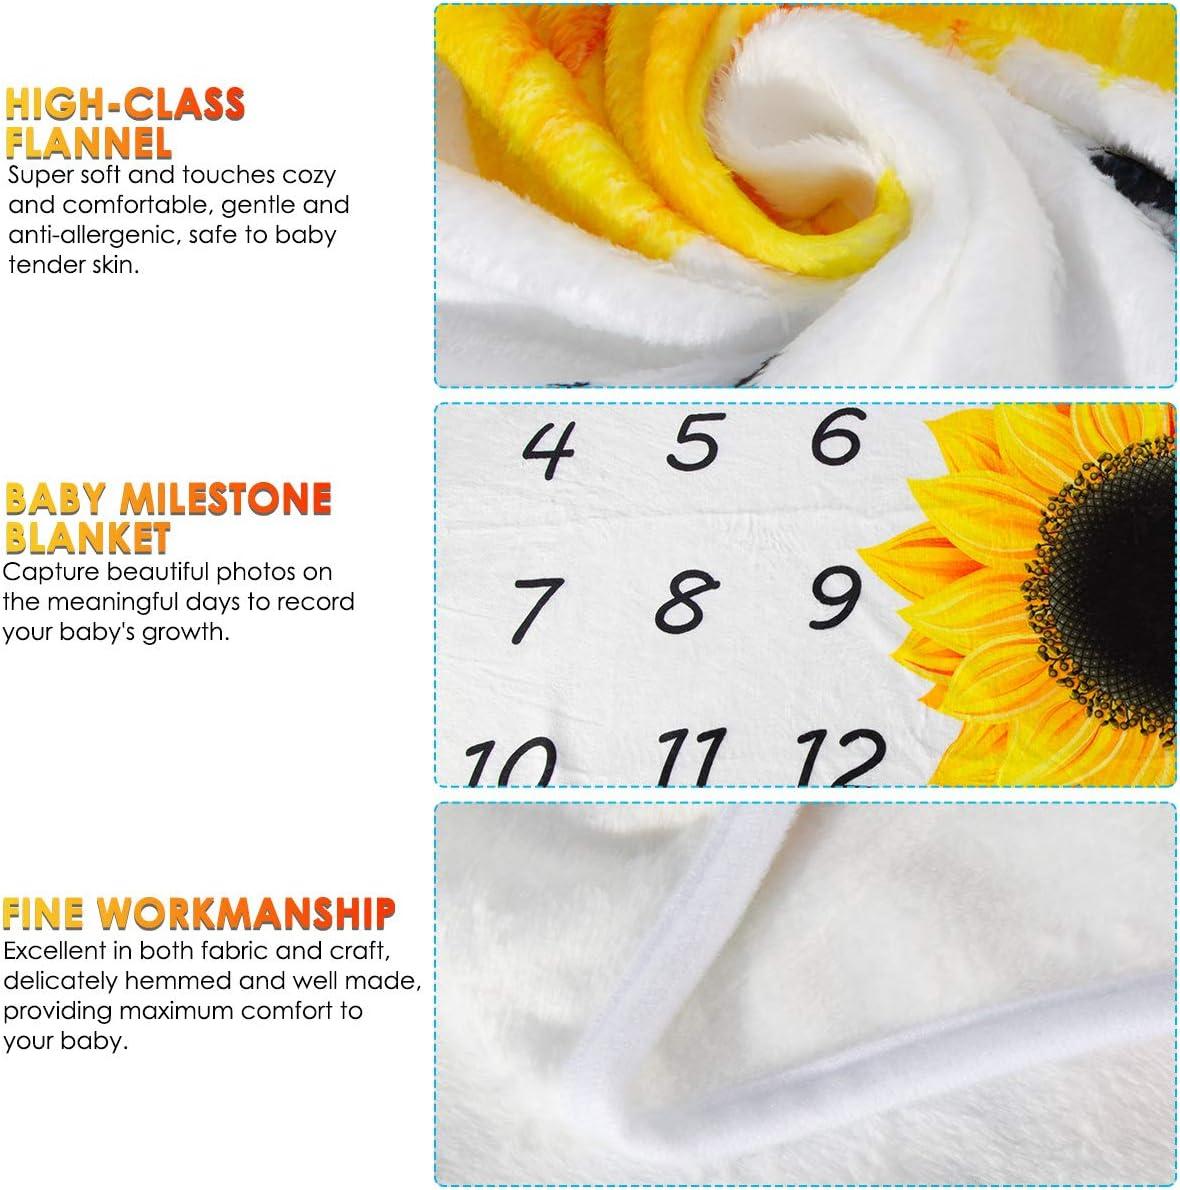 Manta de forro polar para beb/é reci/én nacido Rehomy 39,4 x 29,5 pulgadas regalos para beb/és y ni/ños regalos de fotos y fondos de girasol manta de franela para reci/én nacidos